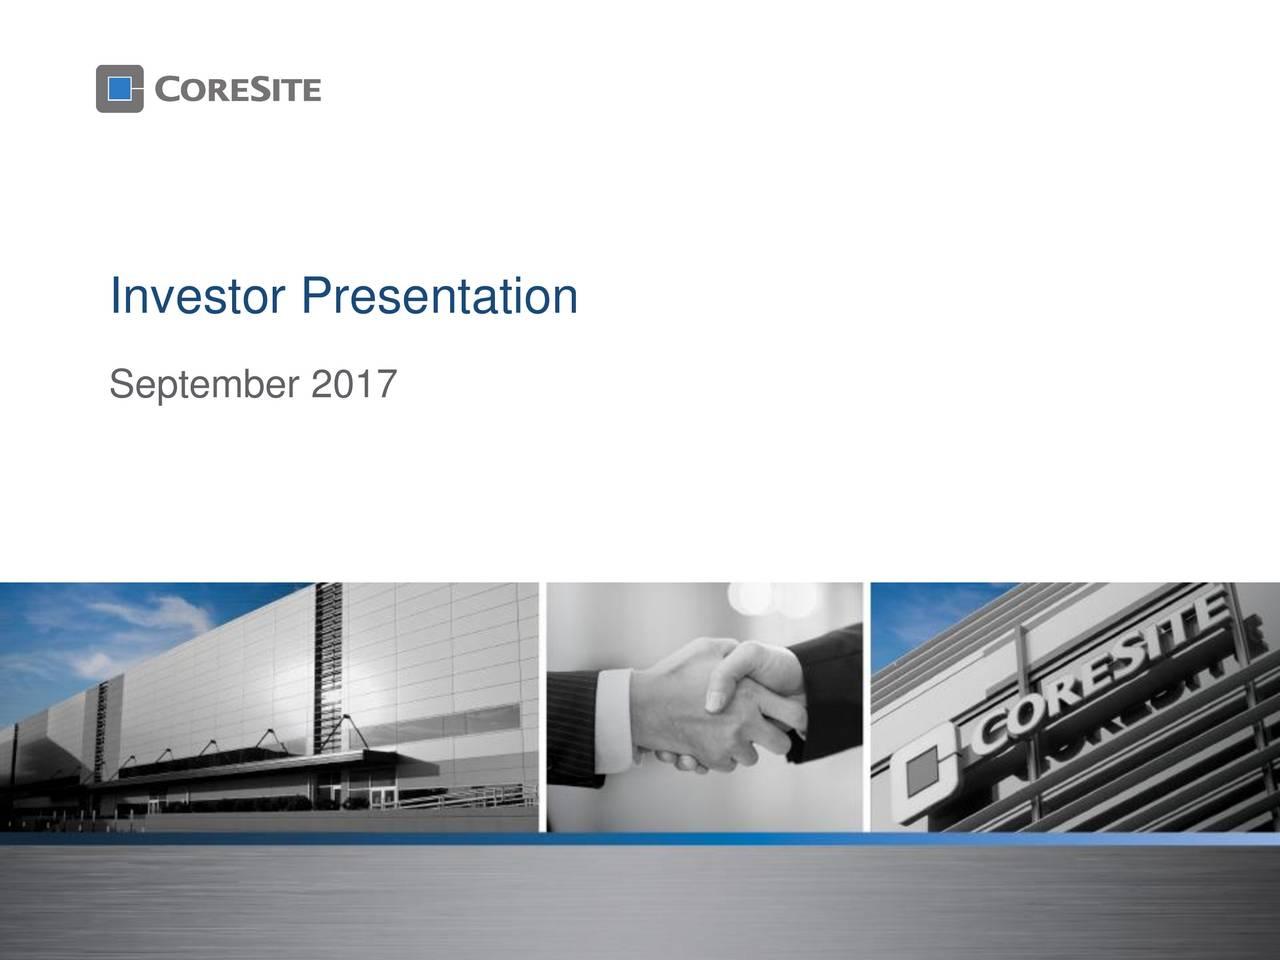 Design Bank Cor.Coresite Realty Cor Presents At Bank Of America Merrill Lynch